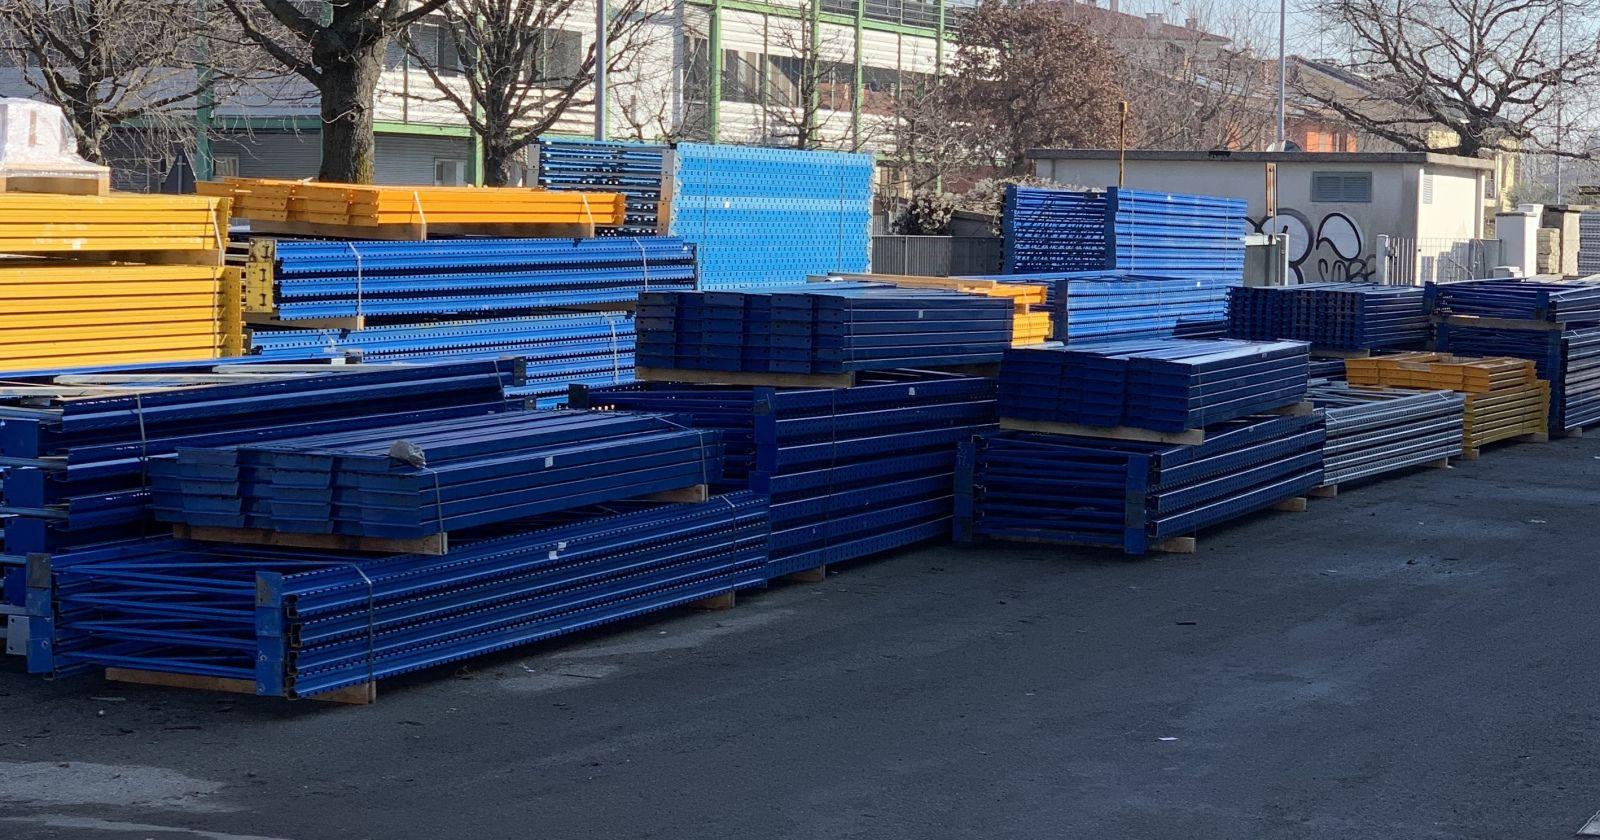 Scaffalature In Ferro Usate.Scaffalature Usate E Nuove Scaffalature Metalliche Industriali